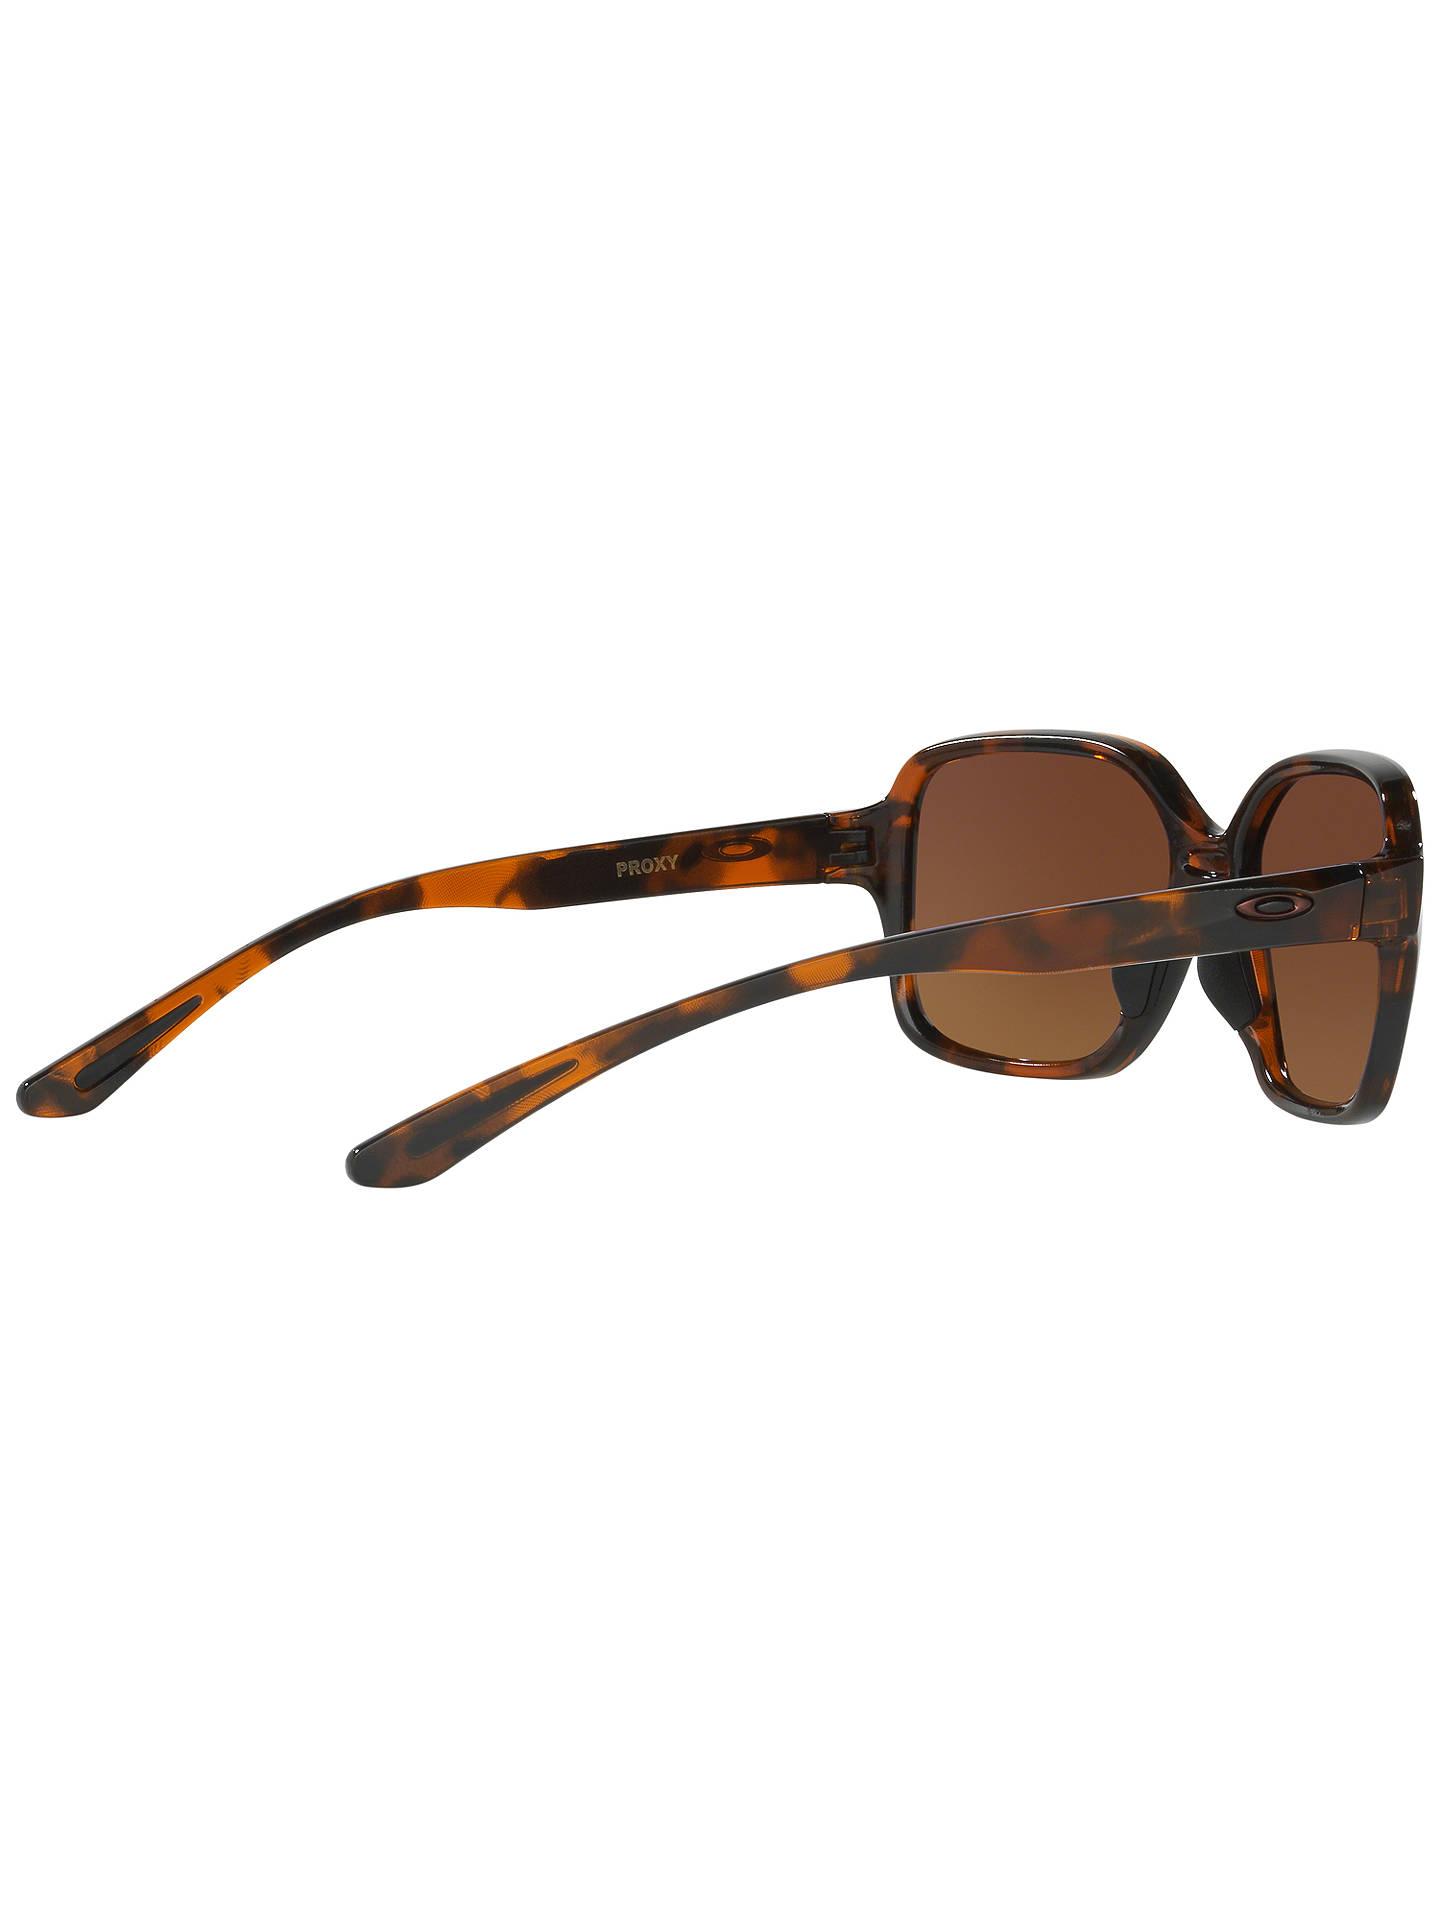 b444a5ef9d ... Buy Oakley OO9312 Proxy Polarised Square Sunglasses